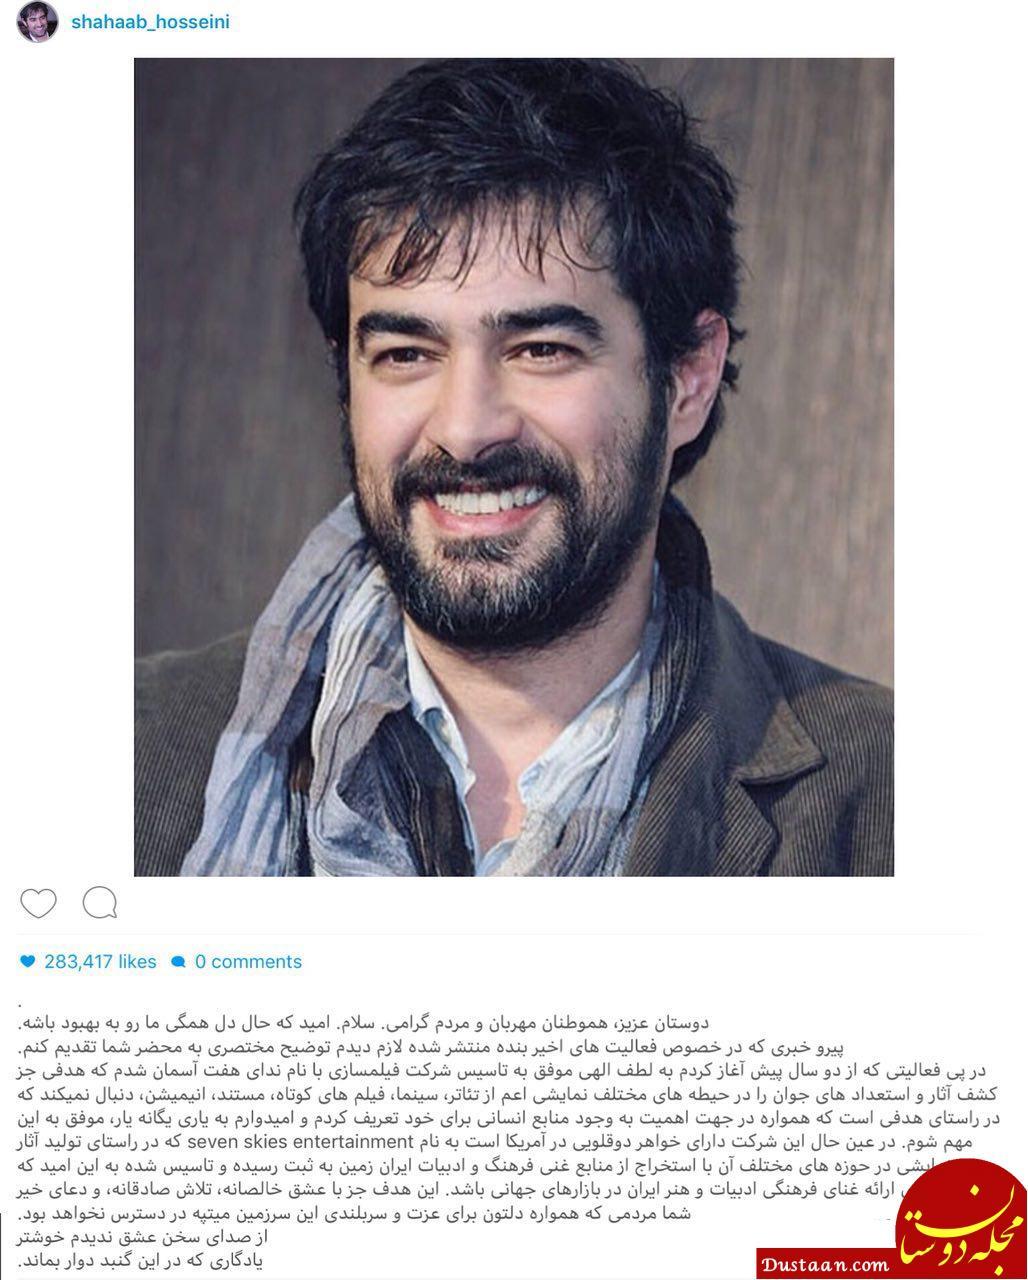 www.dustaan.com توضیحات شهاب حسینی در خصوص تاسیس کمپانی فیلمسازی در آمریکا